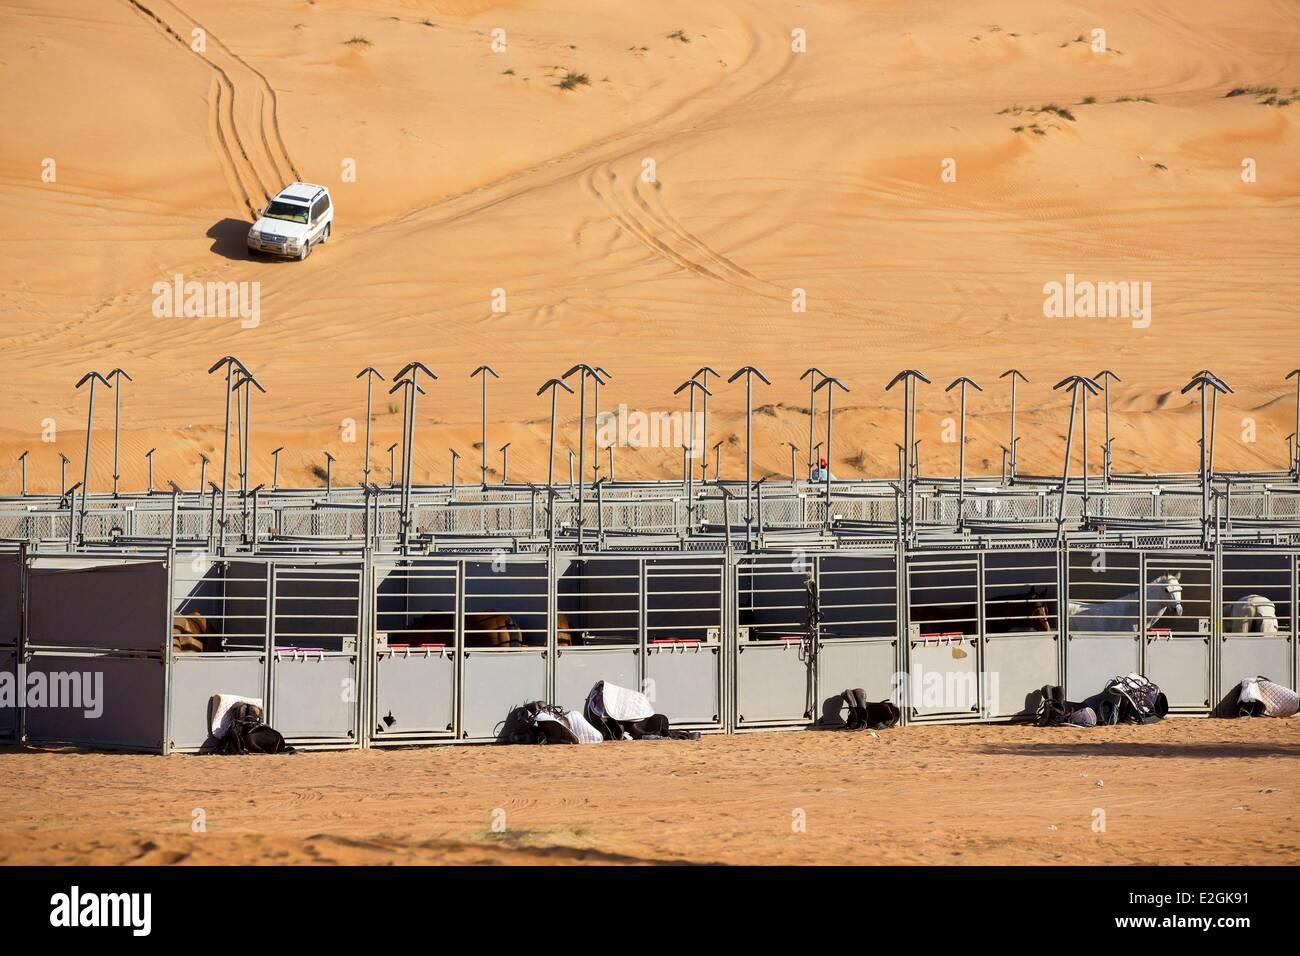 Sultanat d'Oman Frêne région Sharqiyyah désert Wahiba Aventure Equestre galops d'Oman Tawi Photo Stock